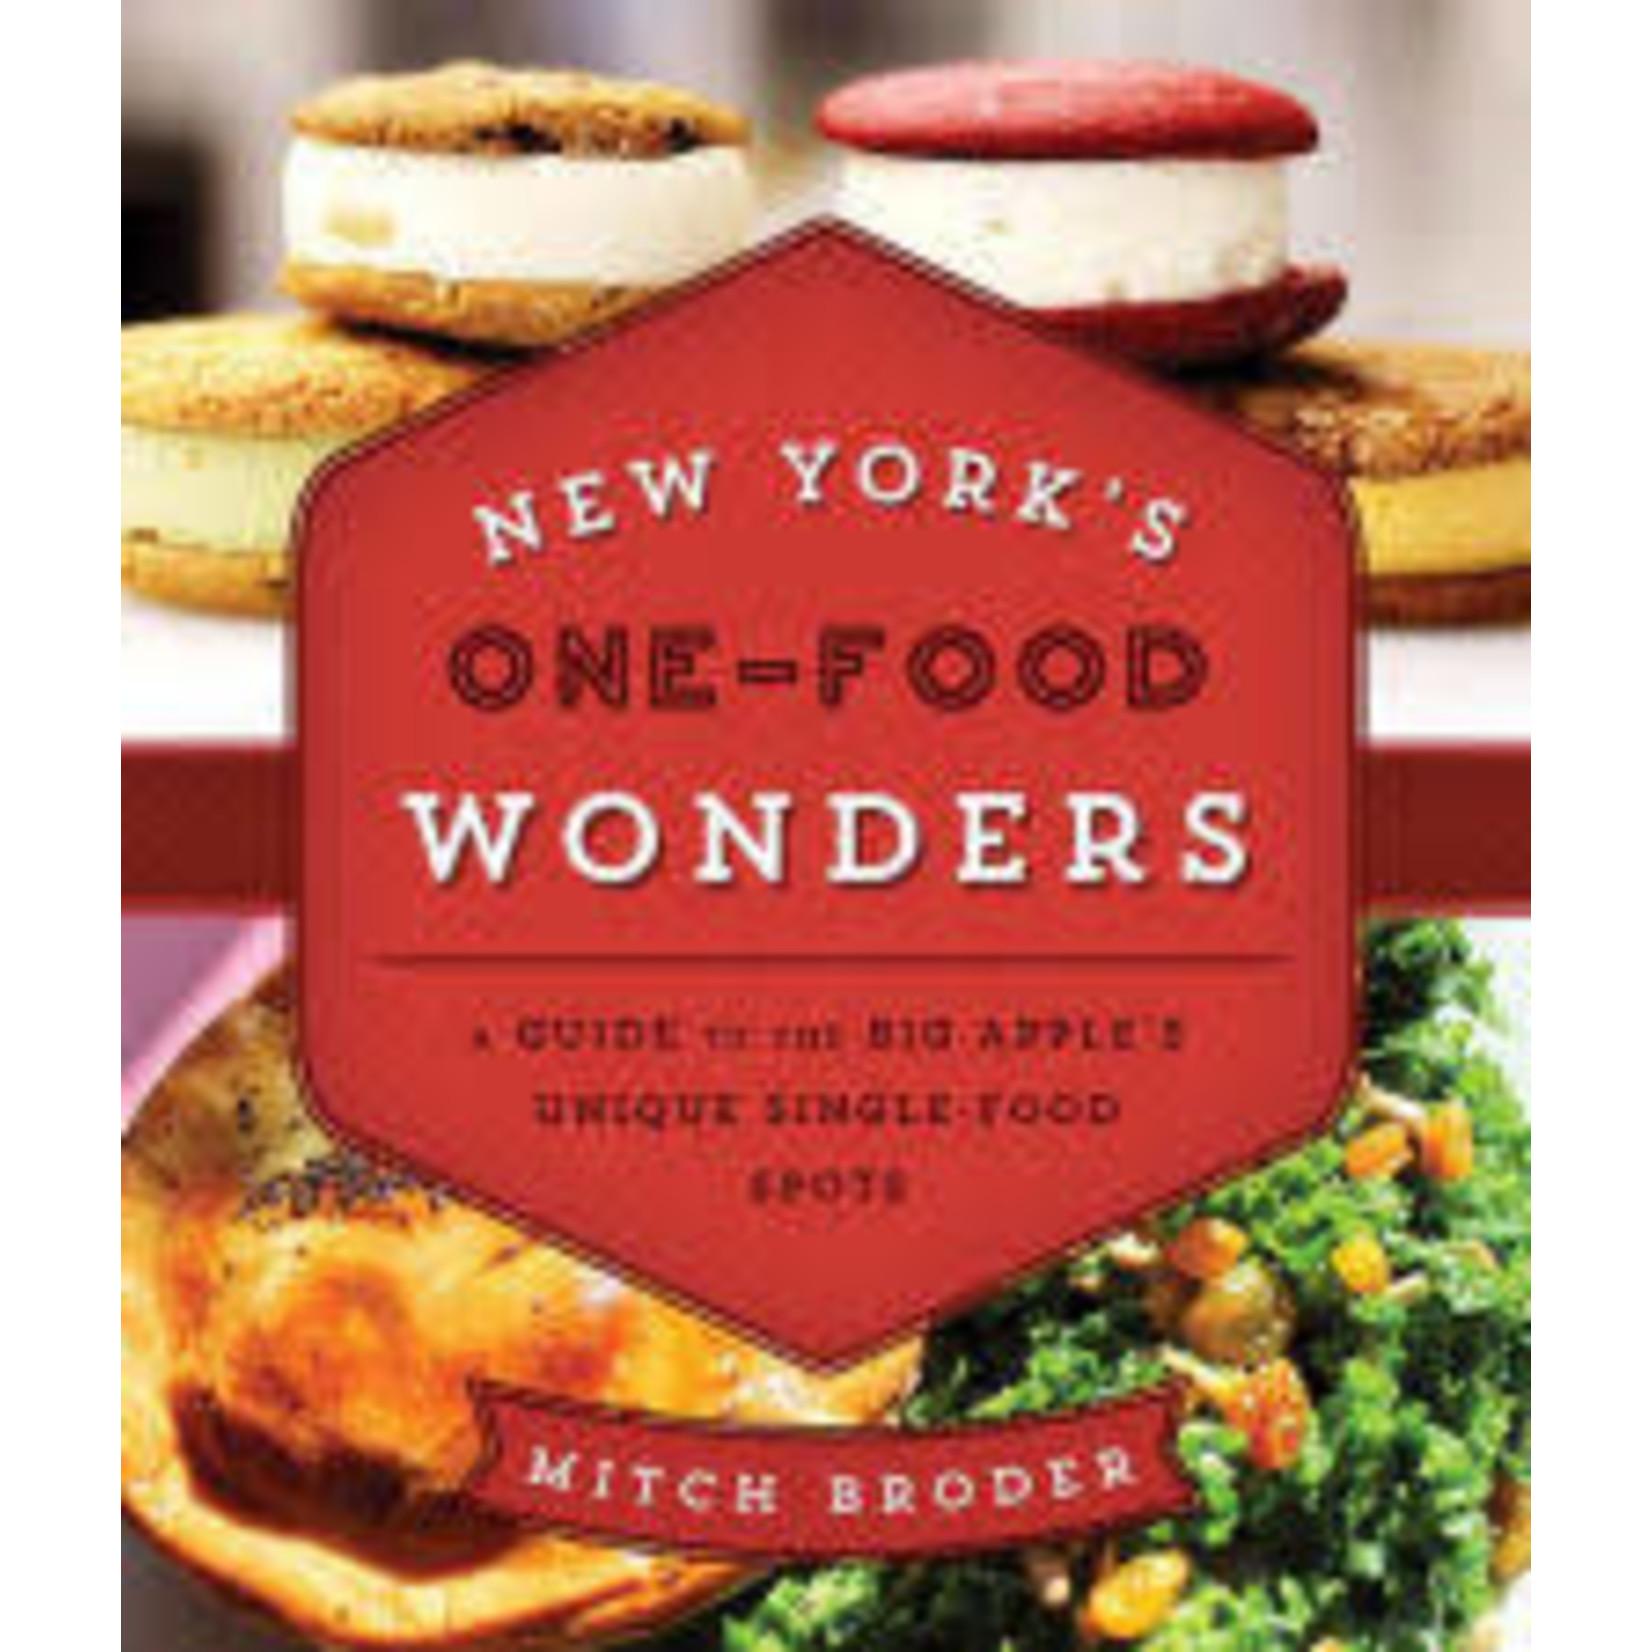 National Book Network New York's One-Food Wonders